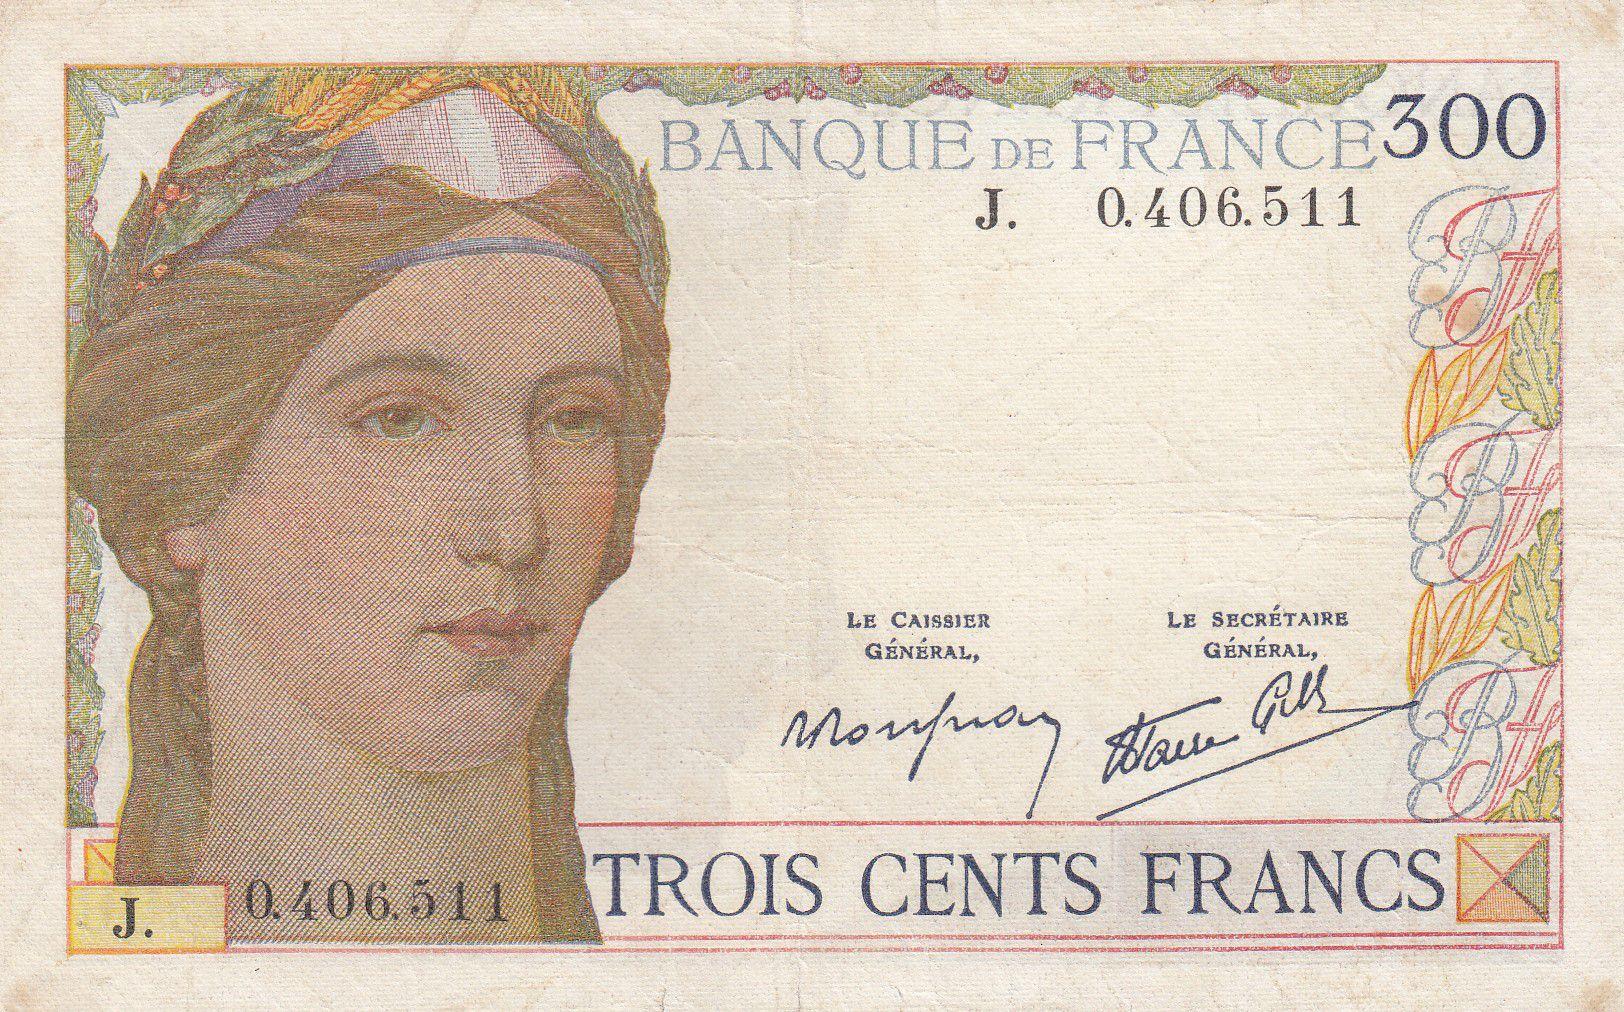 France 300 Francs Ceres and Mercury - 06-10-1938 - J.0.406.511 - VF